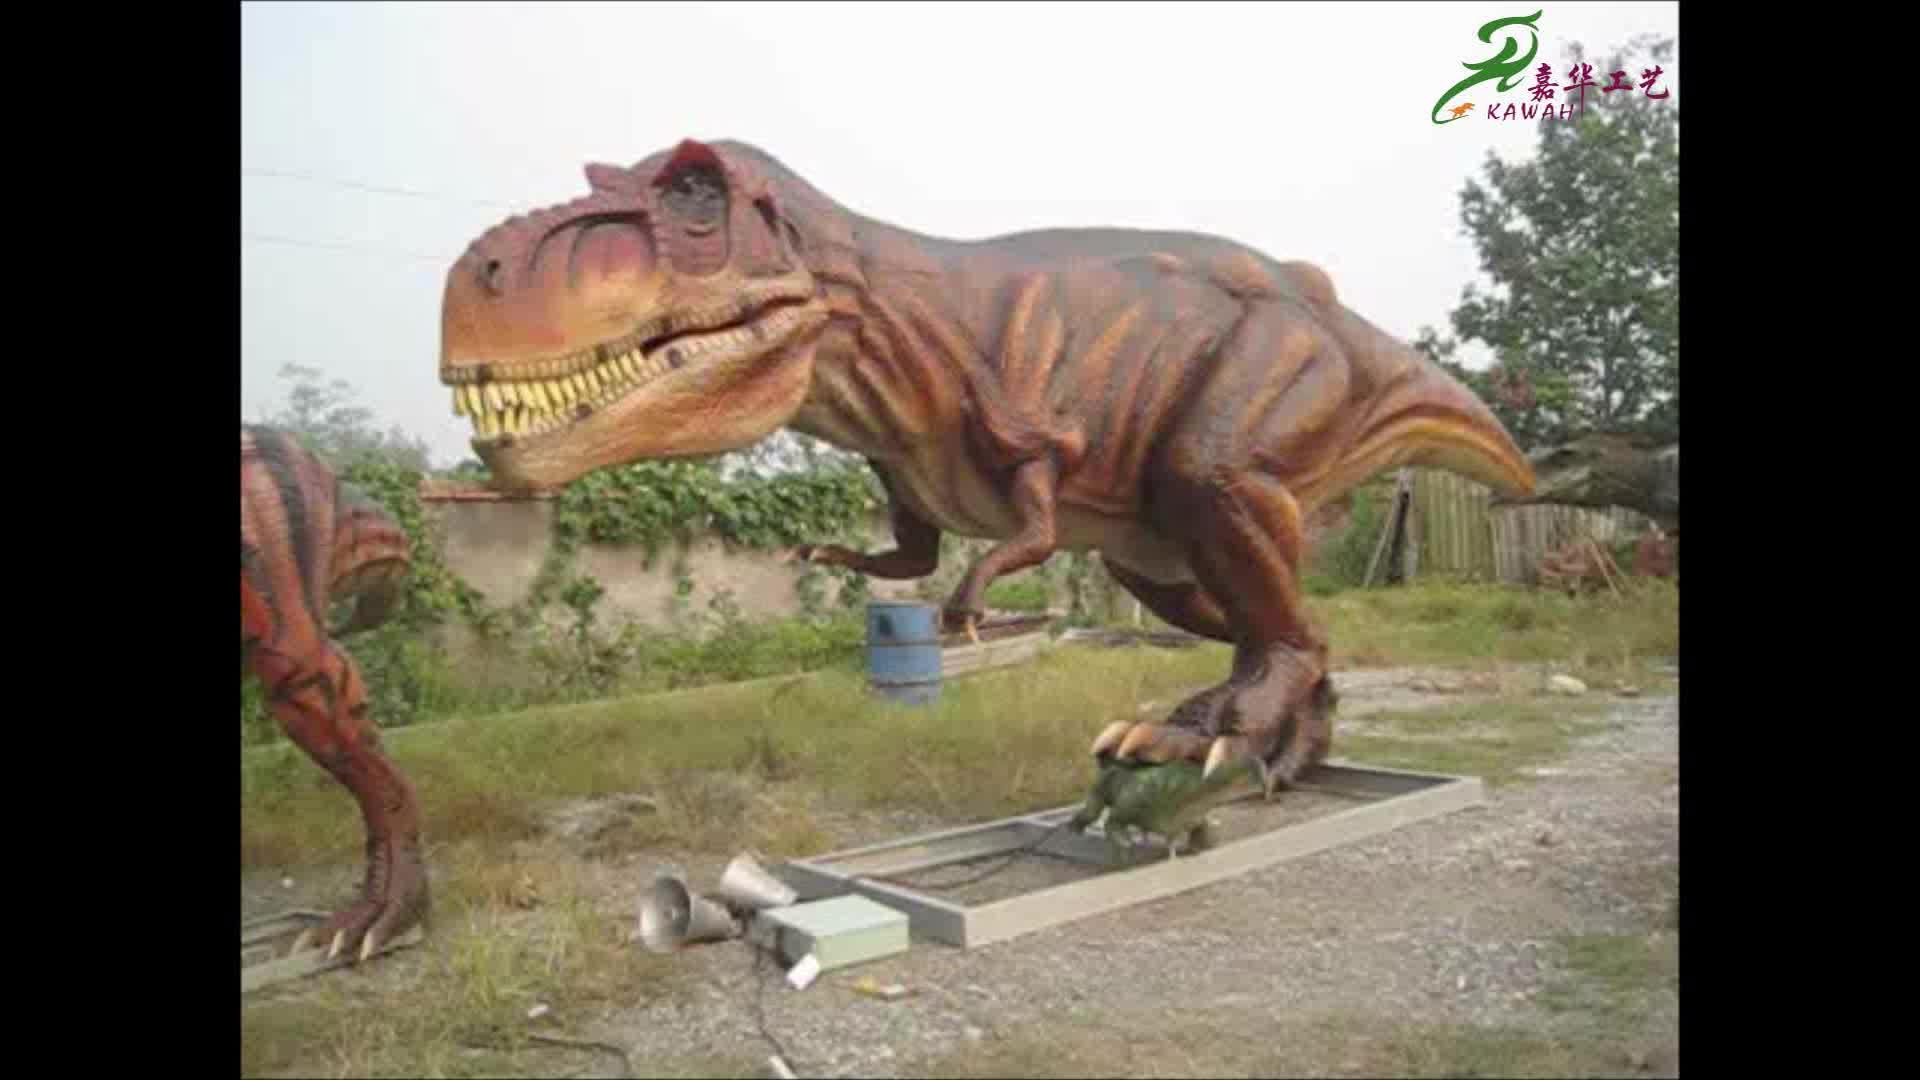 Life Size Fiberglass Dinosaur Statue Of T-rex Statue For